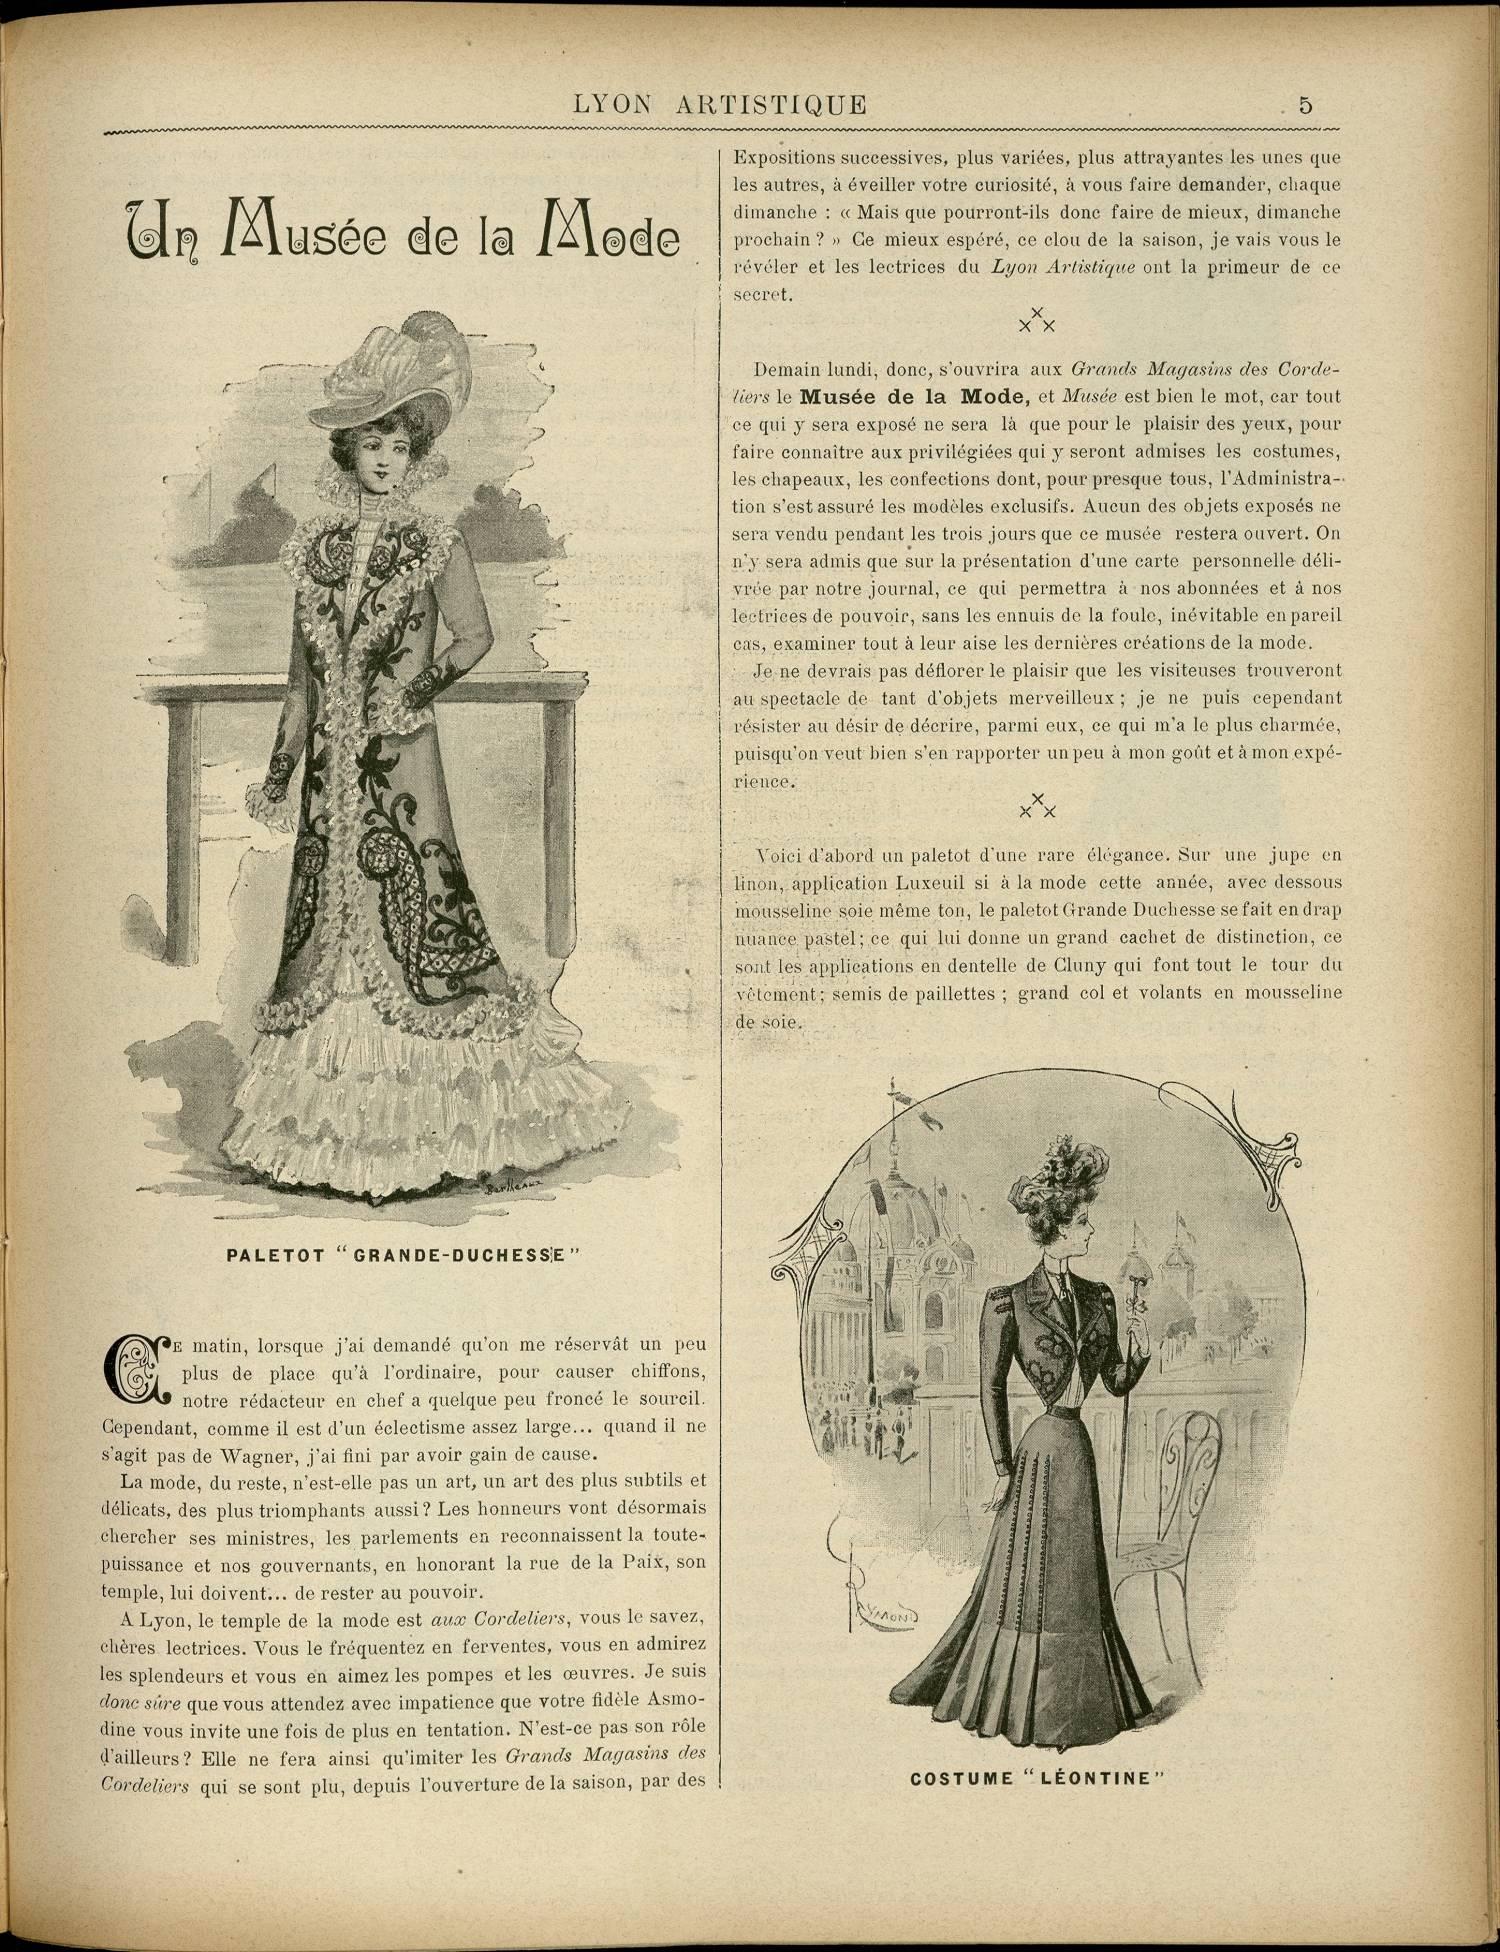 Contenu textuel de l'image : UN MUSEE DE LA MODE